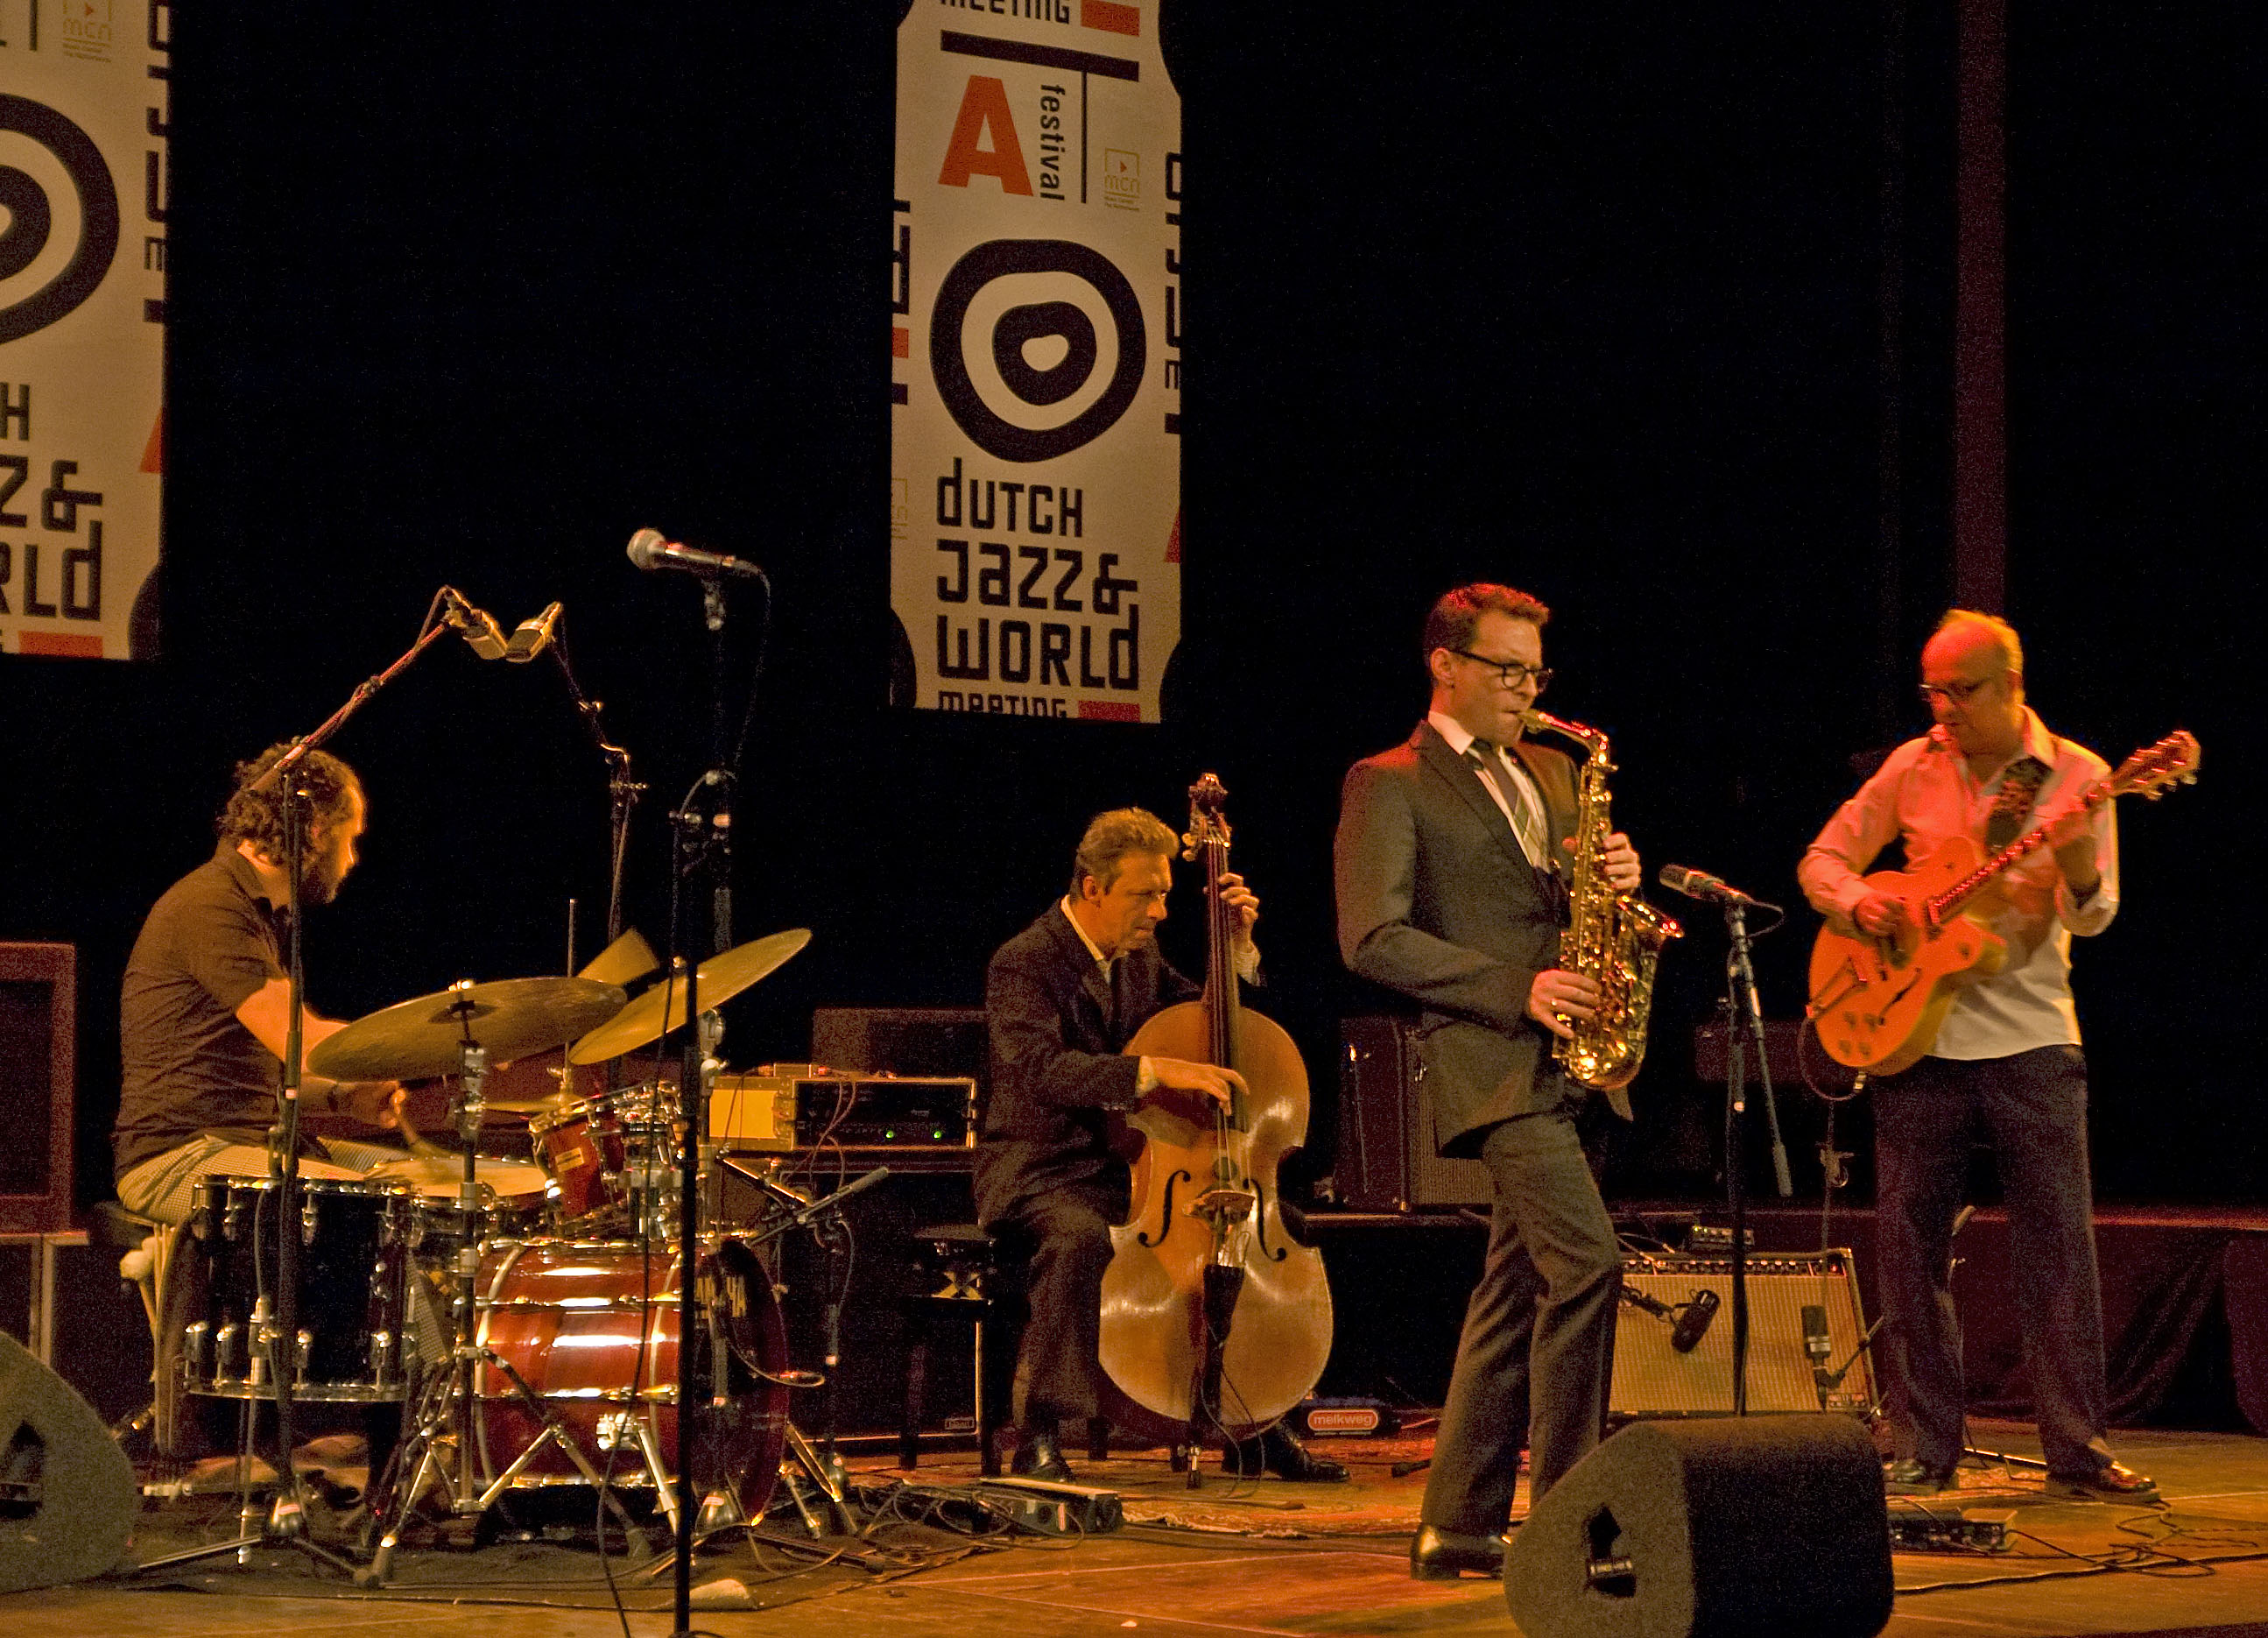 Benjamin Herman Quartet at Dutch Jazz & World Meeting, December 2, 2010